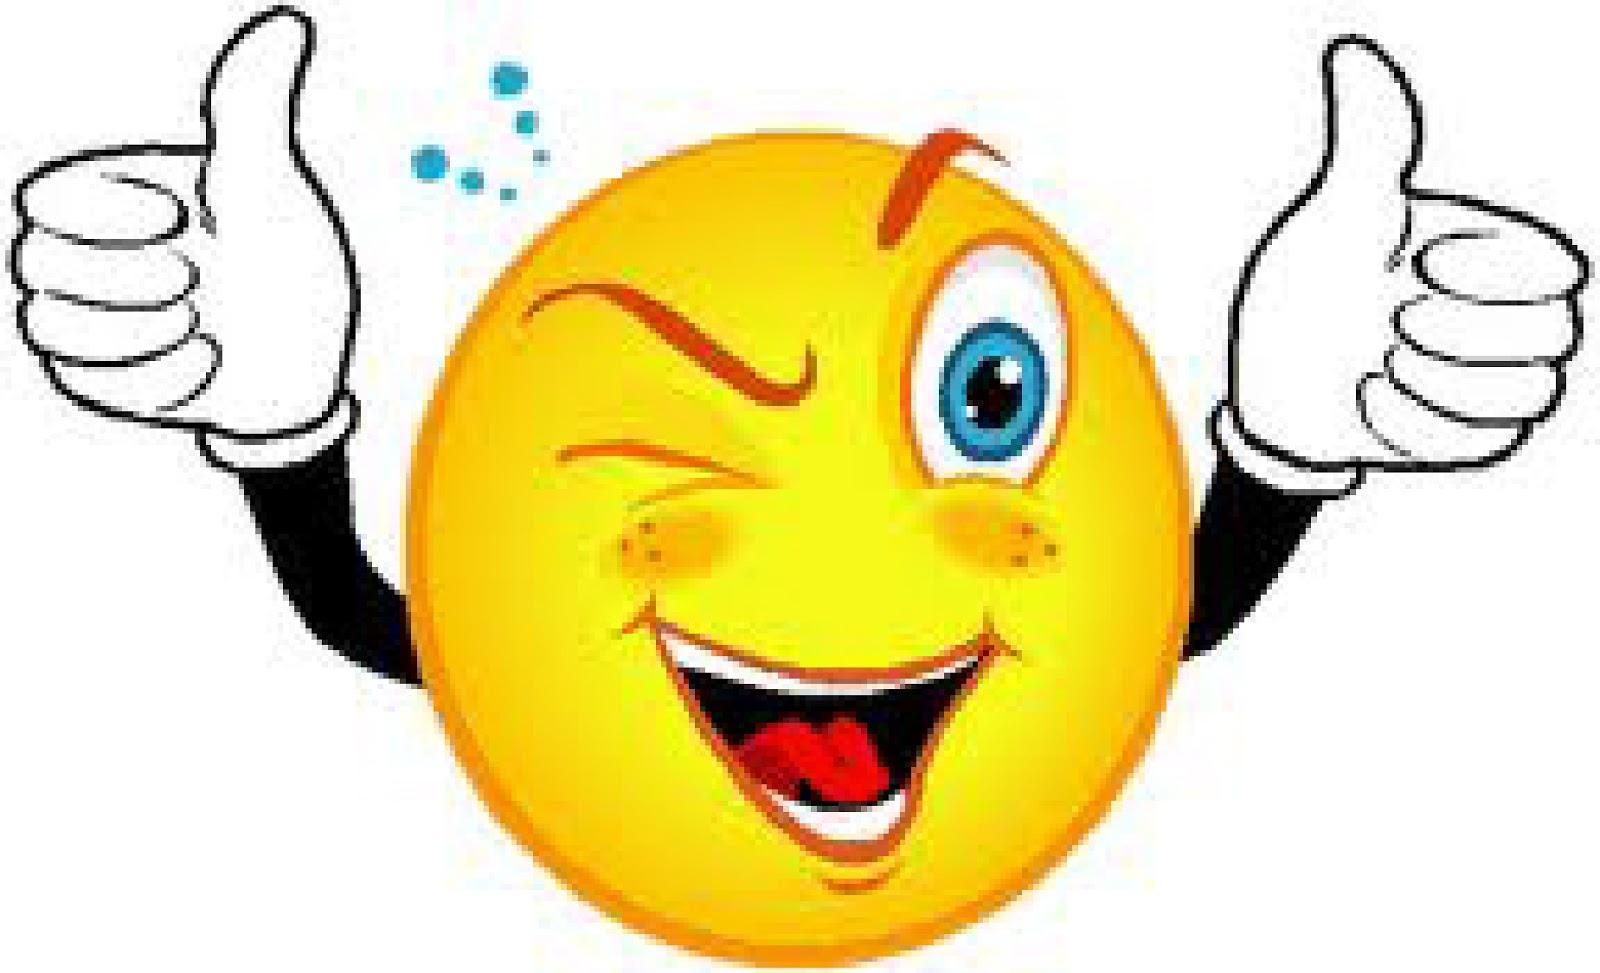 Smiley Face Waving Goodbye - Cliparts.co